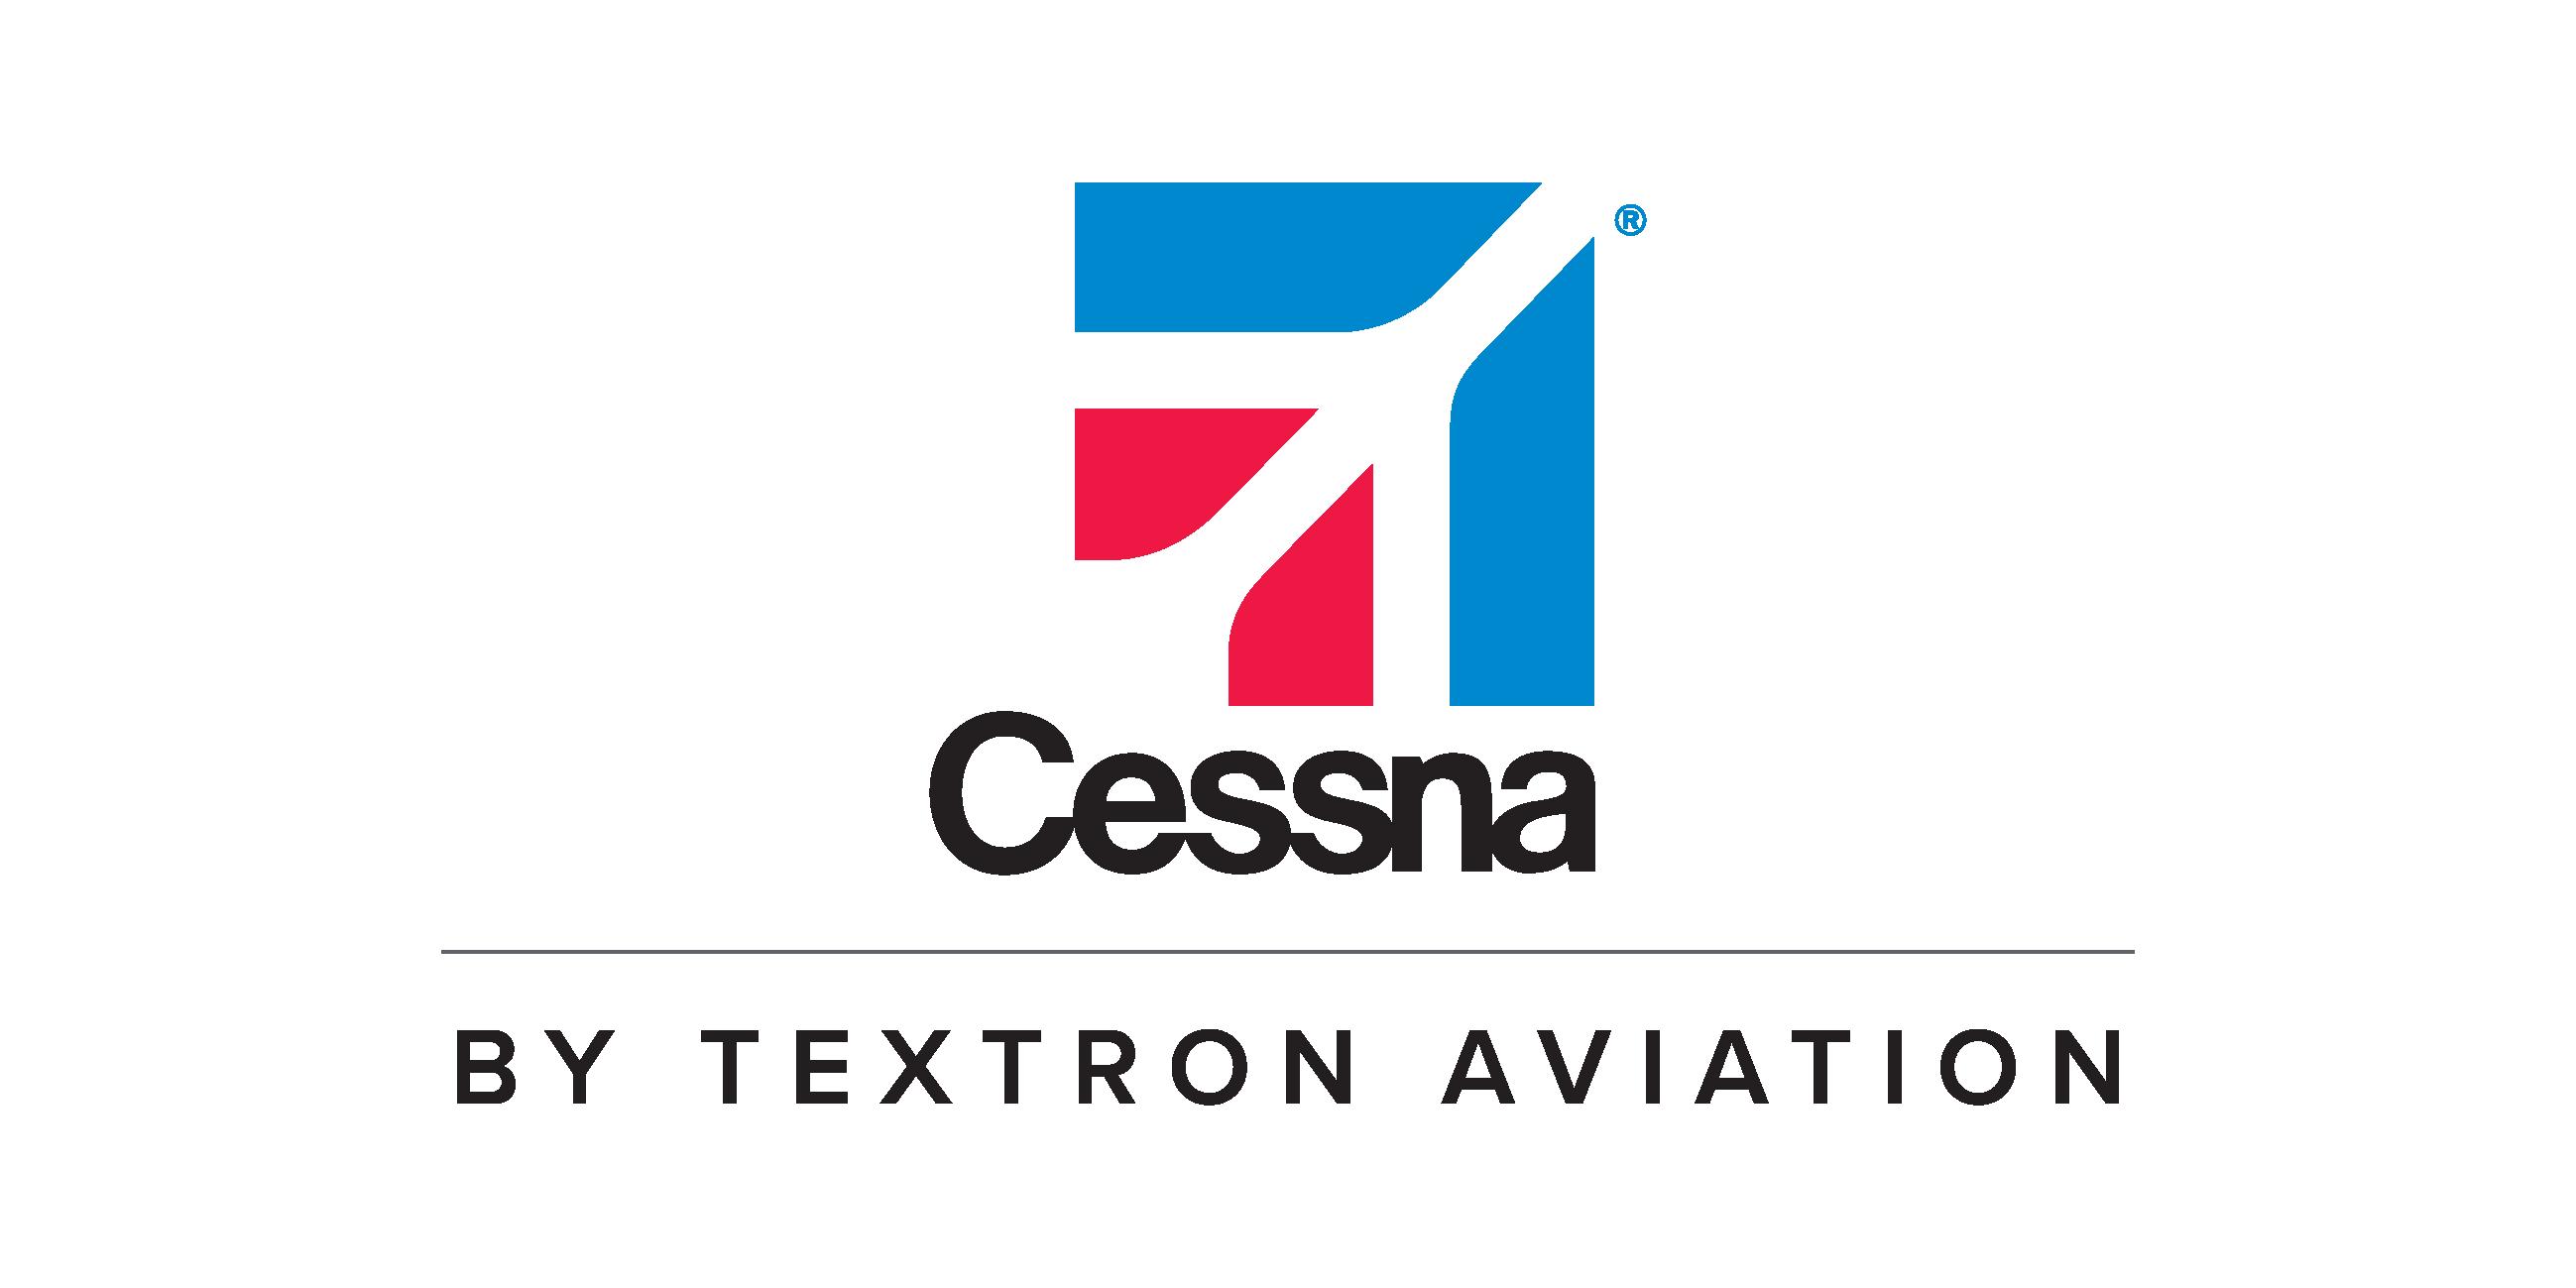 cessna by textron aviation